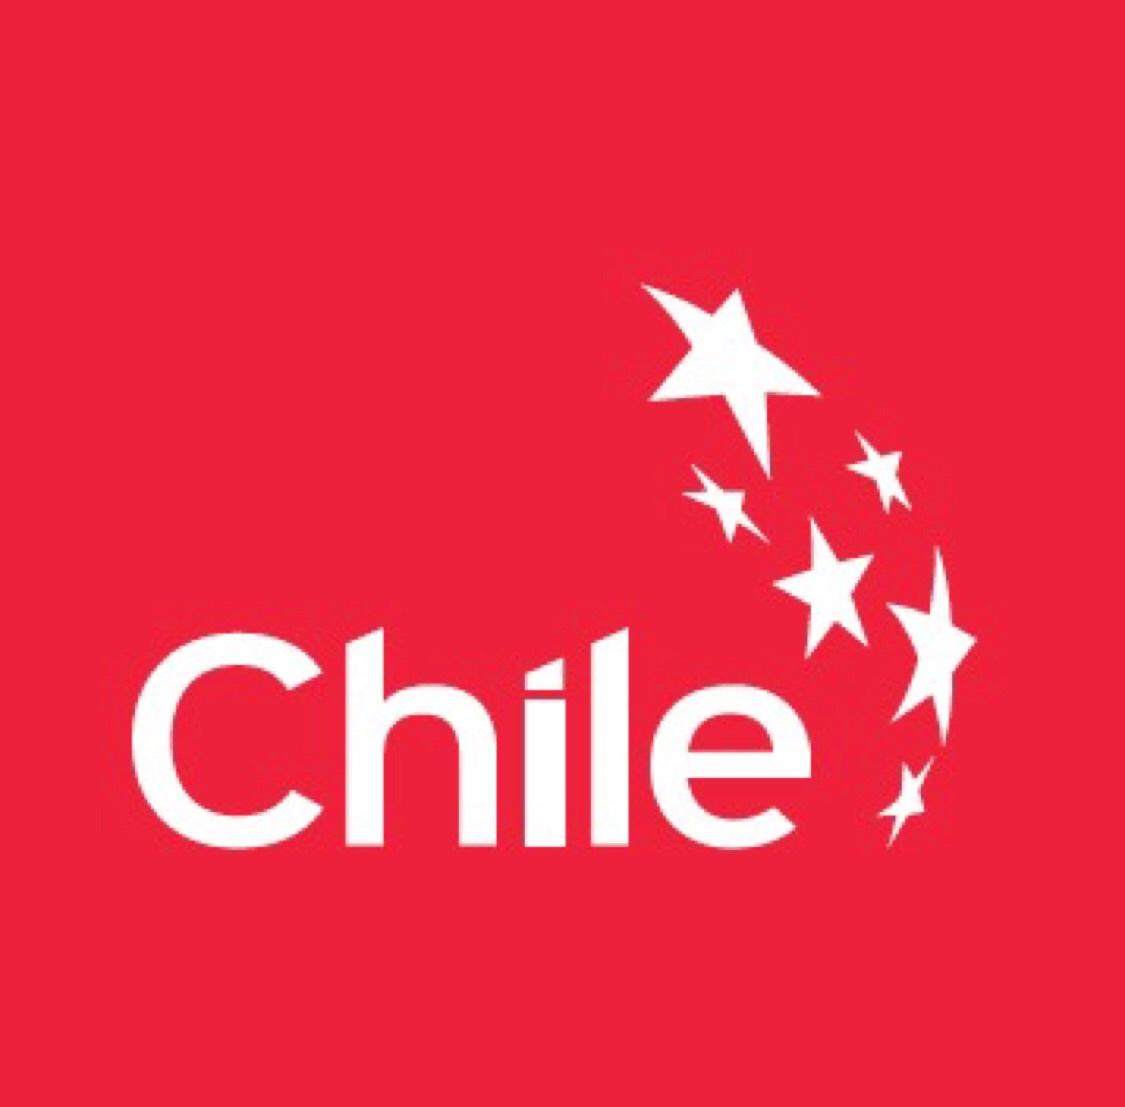 Tourism Board of Chile